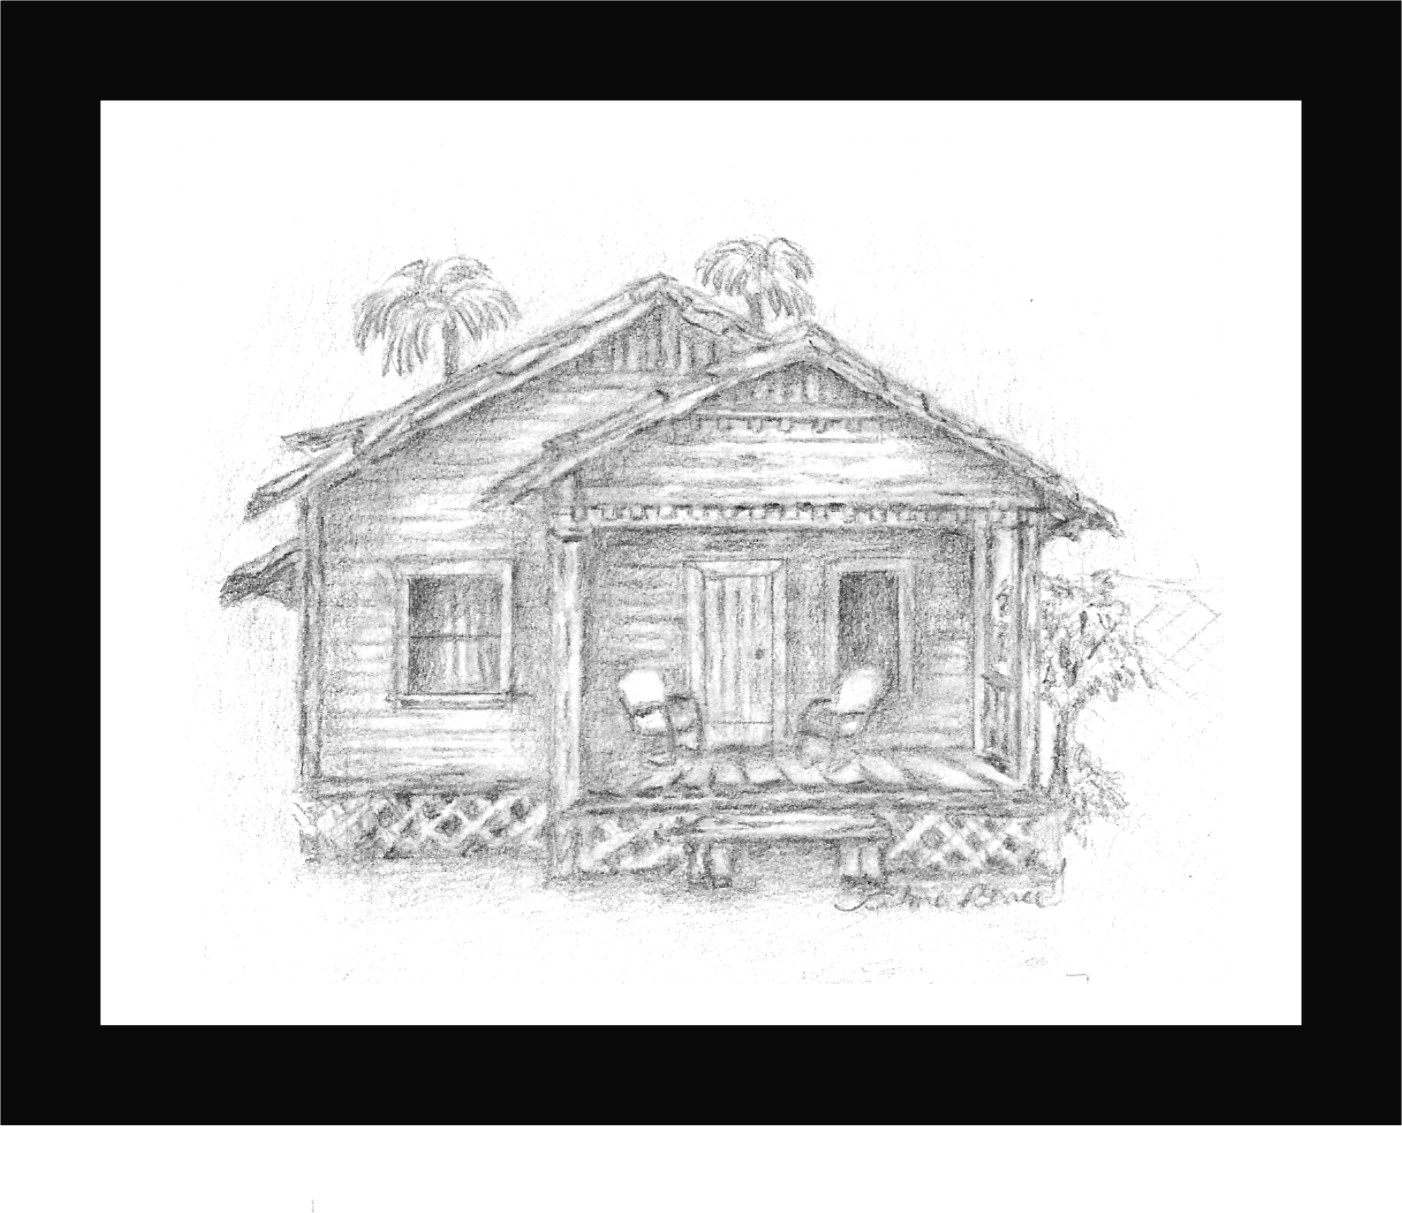 La casita de madera dibujo a lapiz alma renee 39 s blog - Imagenes de casas para dibujar ...